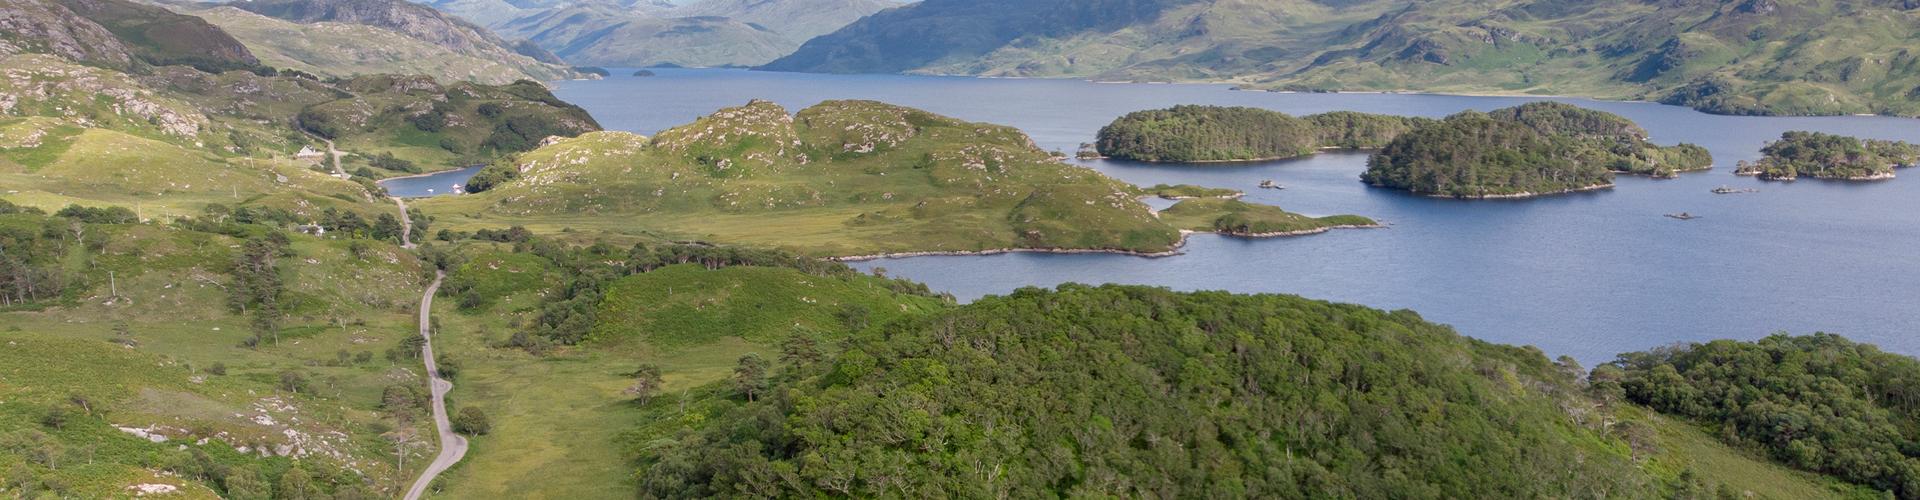 Loch Morar shot from air looking west